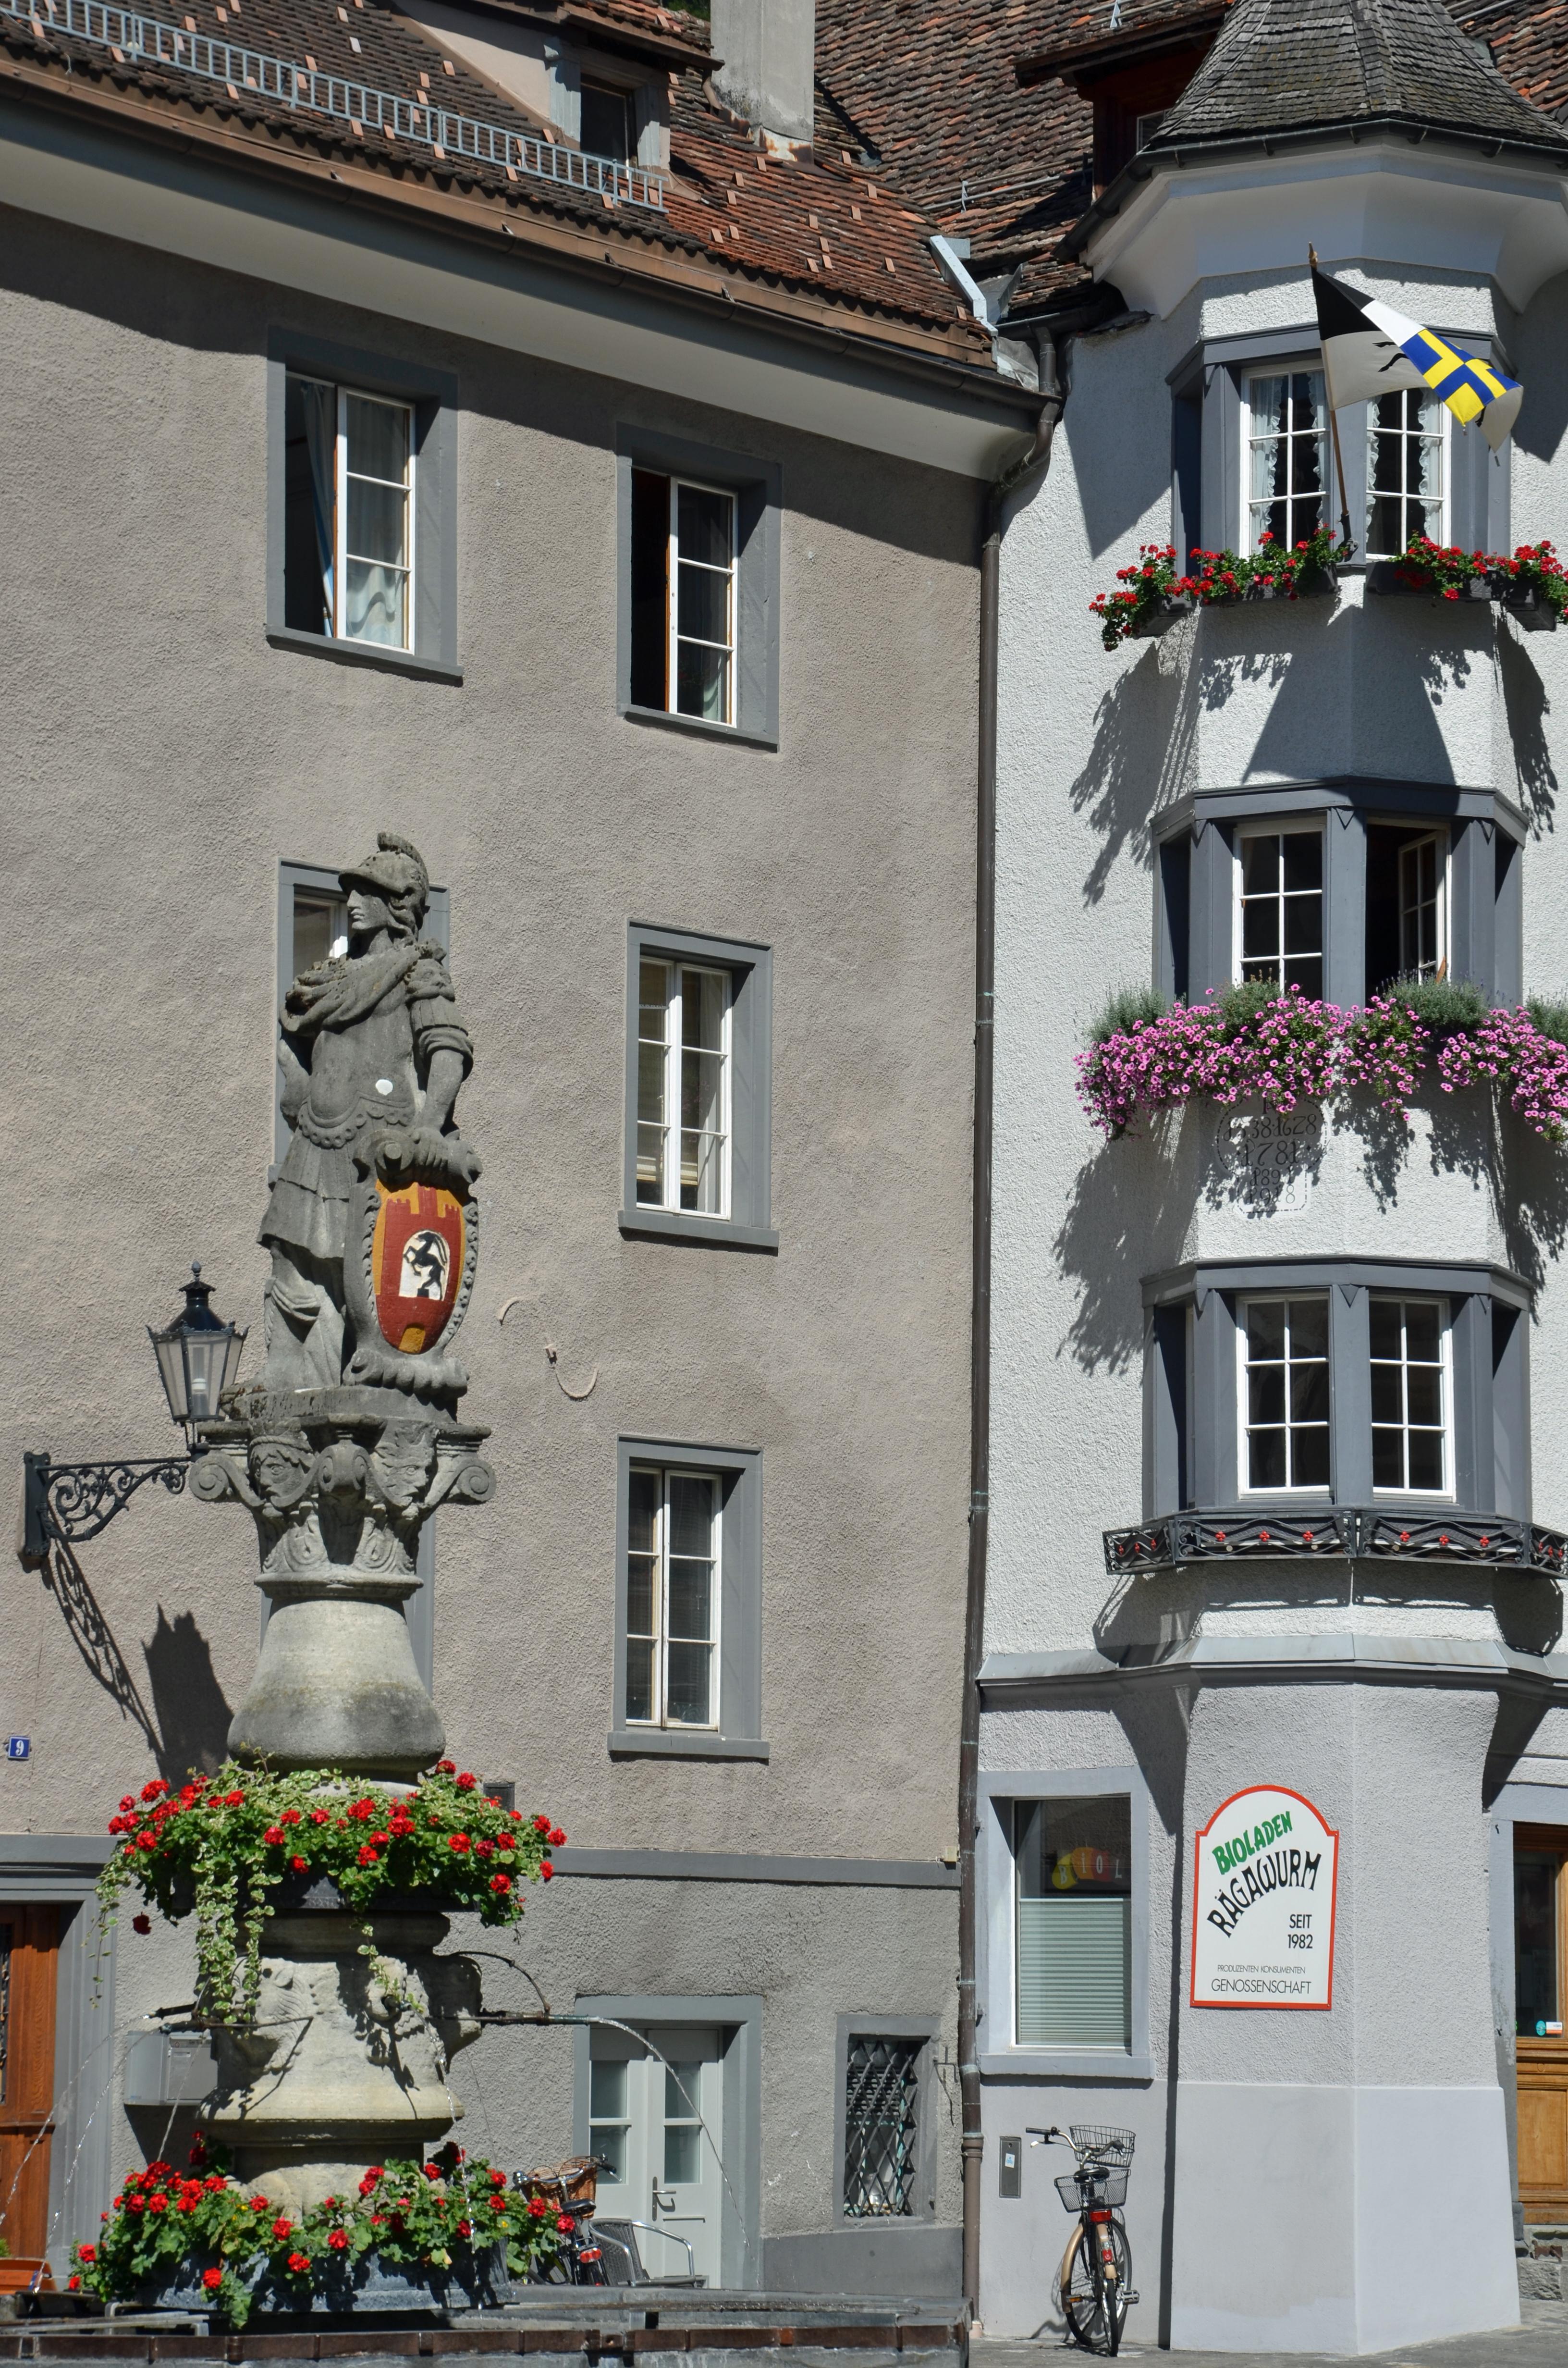 Plac św. Marcina, St. Martinsplatz Chur